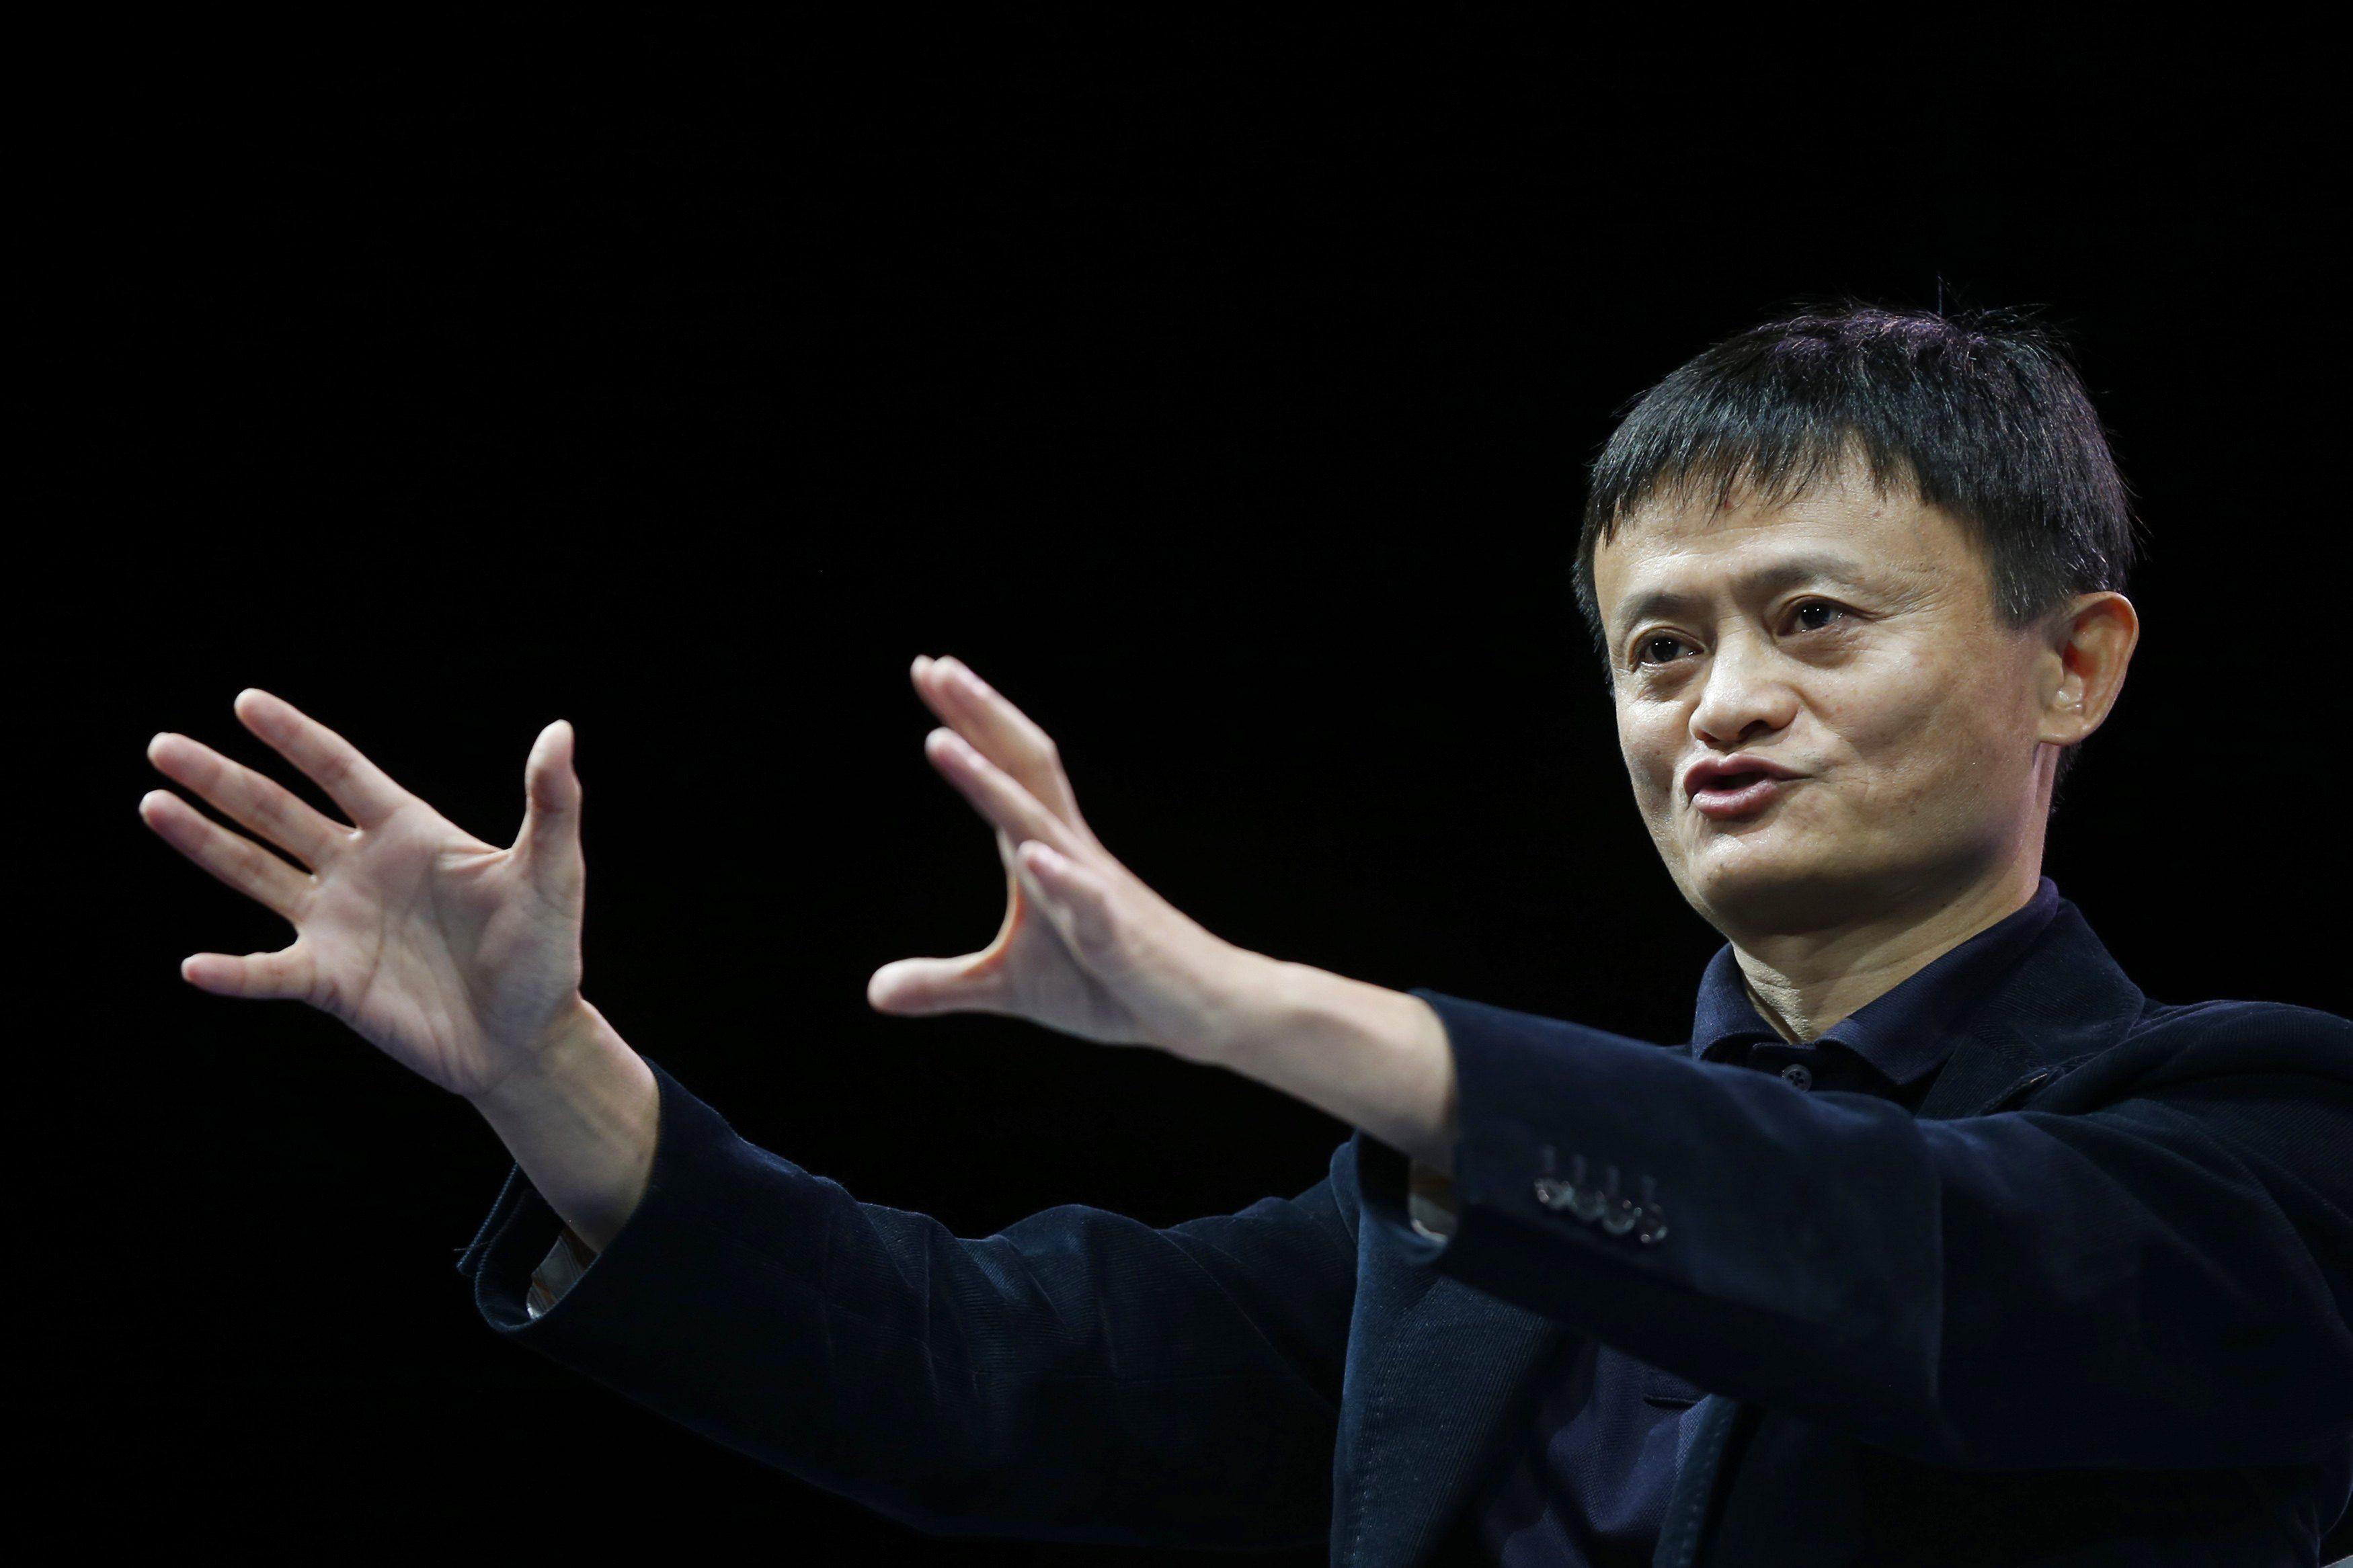 Jack Ma, le patron du géant chinois Alibaba, prend sa retraite